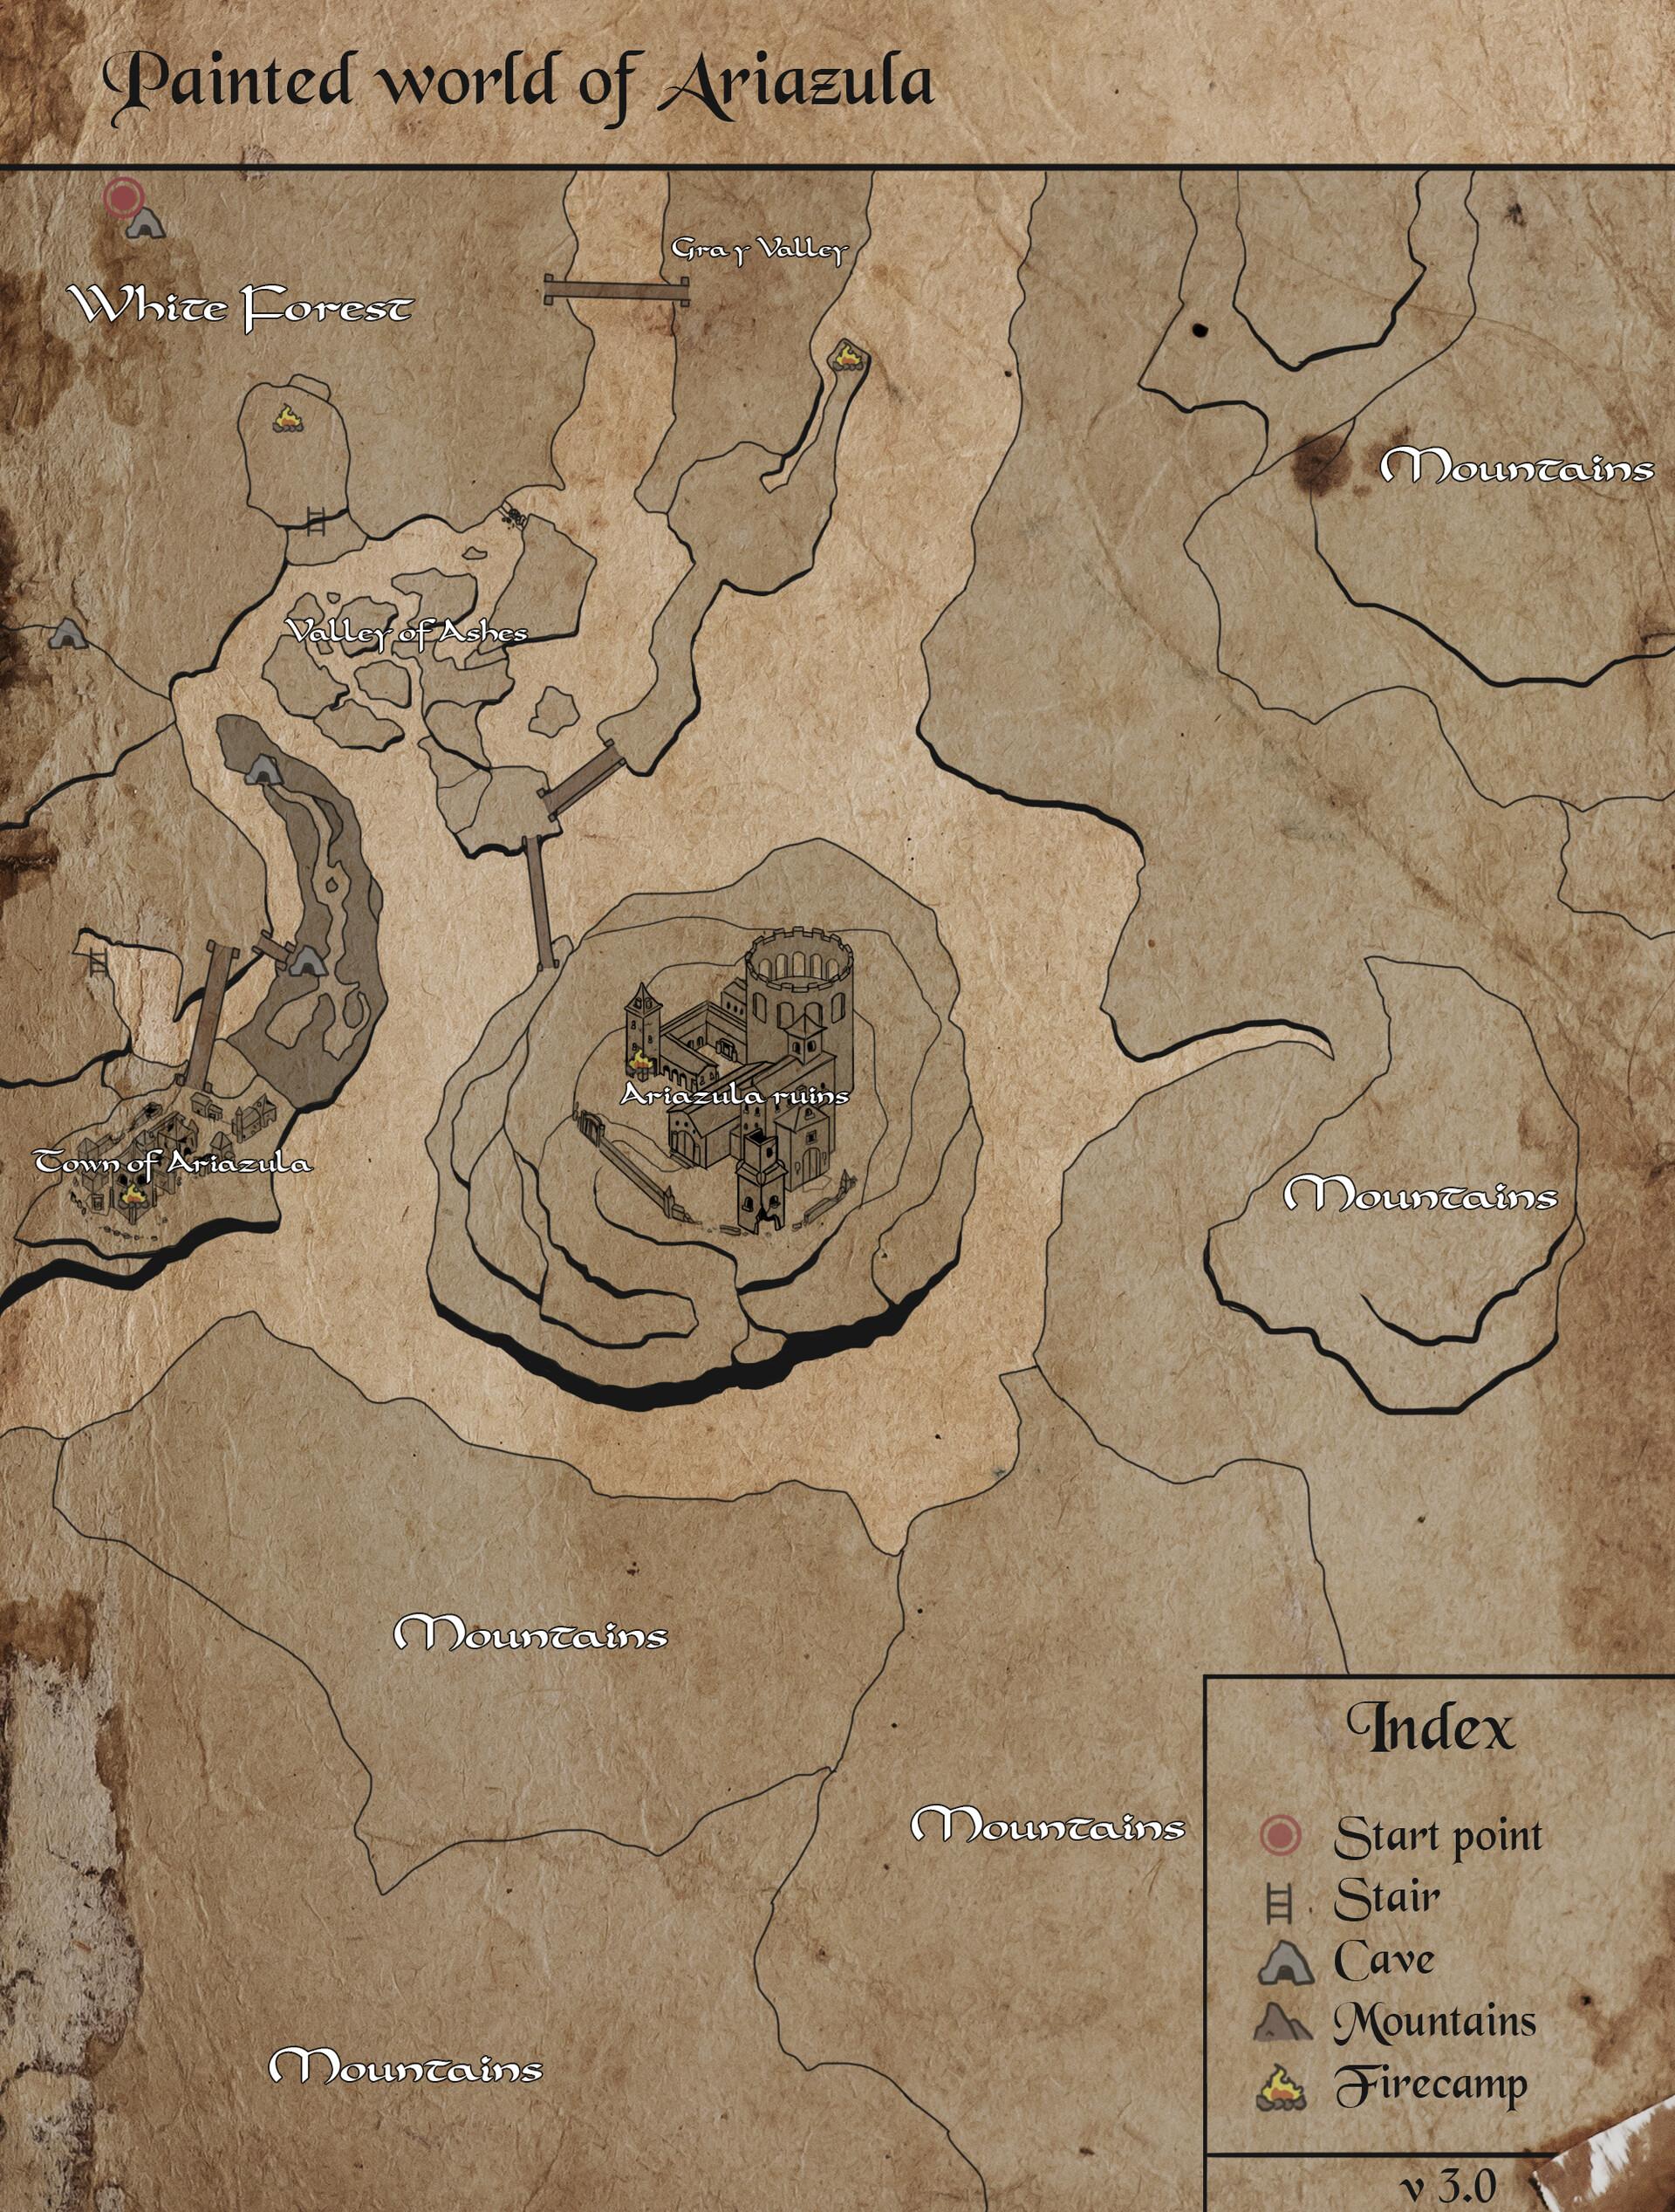 Dark Souls 2 World Map : souls, world, ArtStation, Painted, World, Ariazula, Darksouls, (College, Project, Anhembi, Morumbi),, Sousa